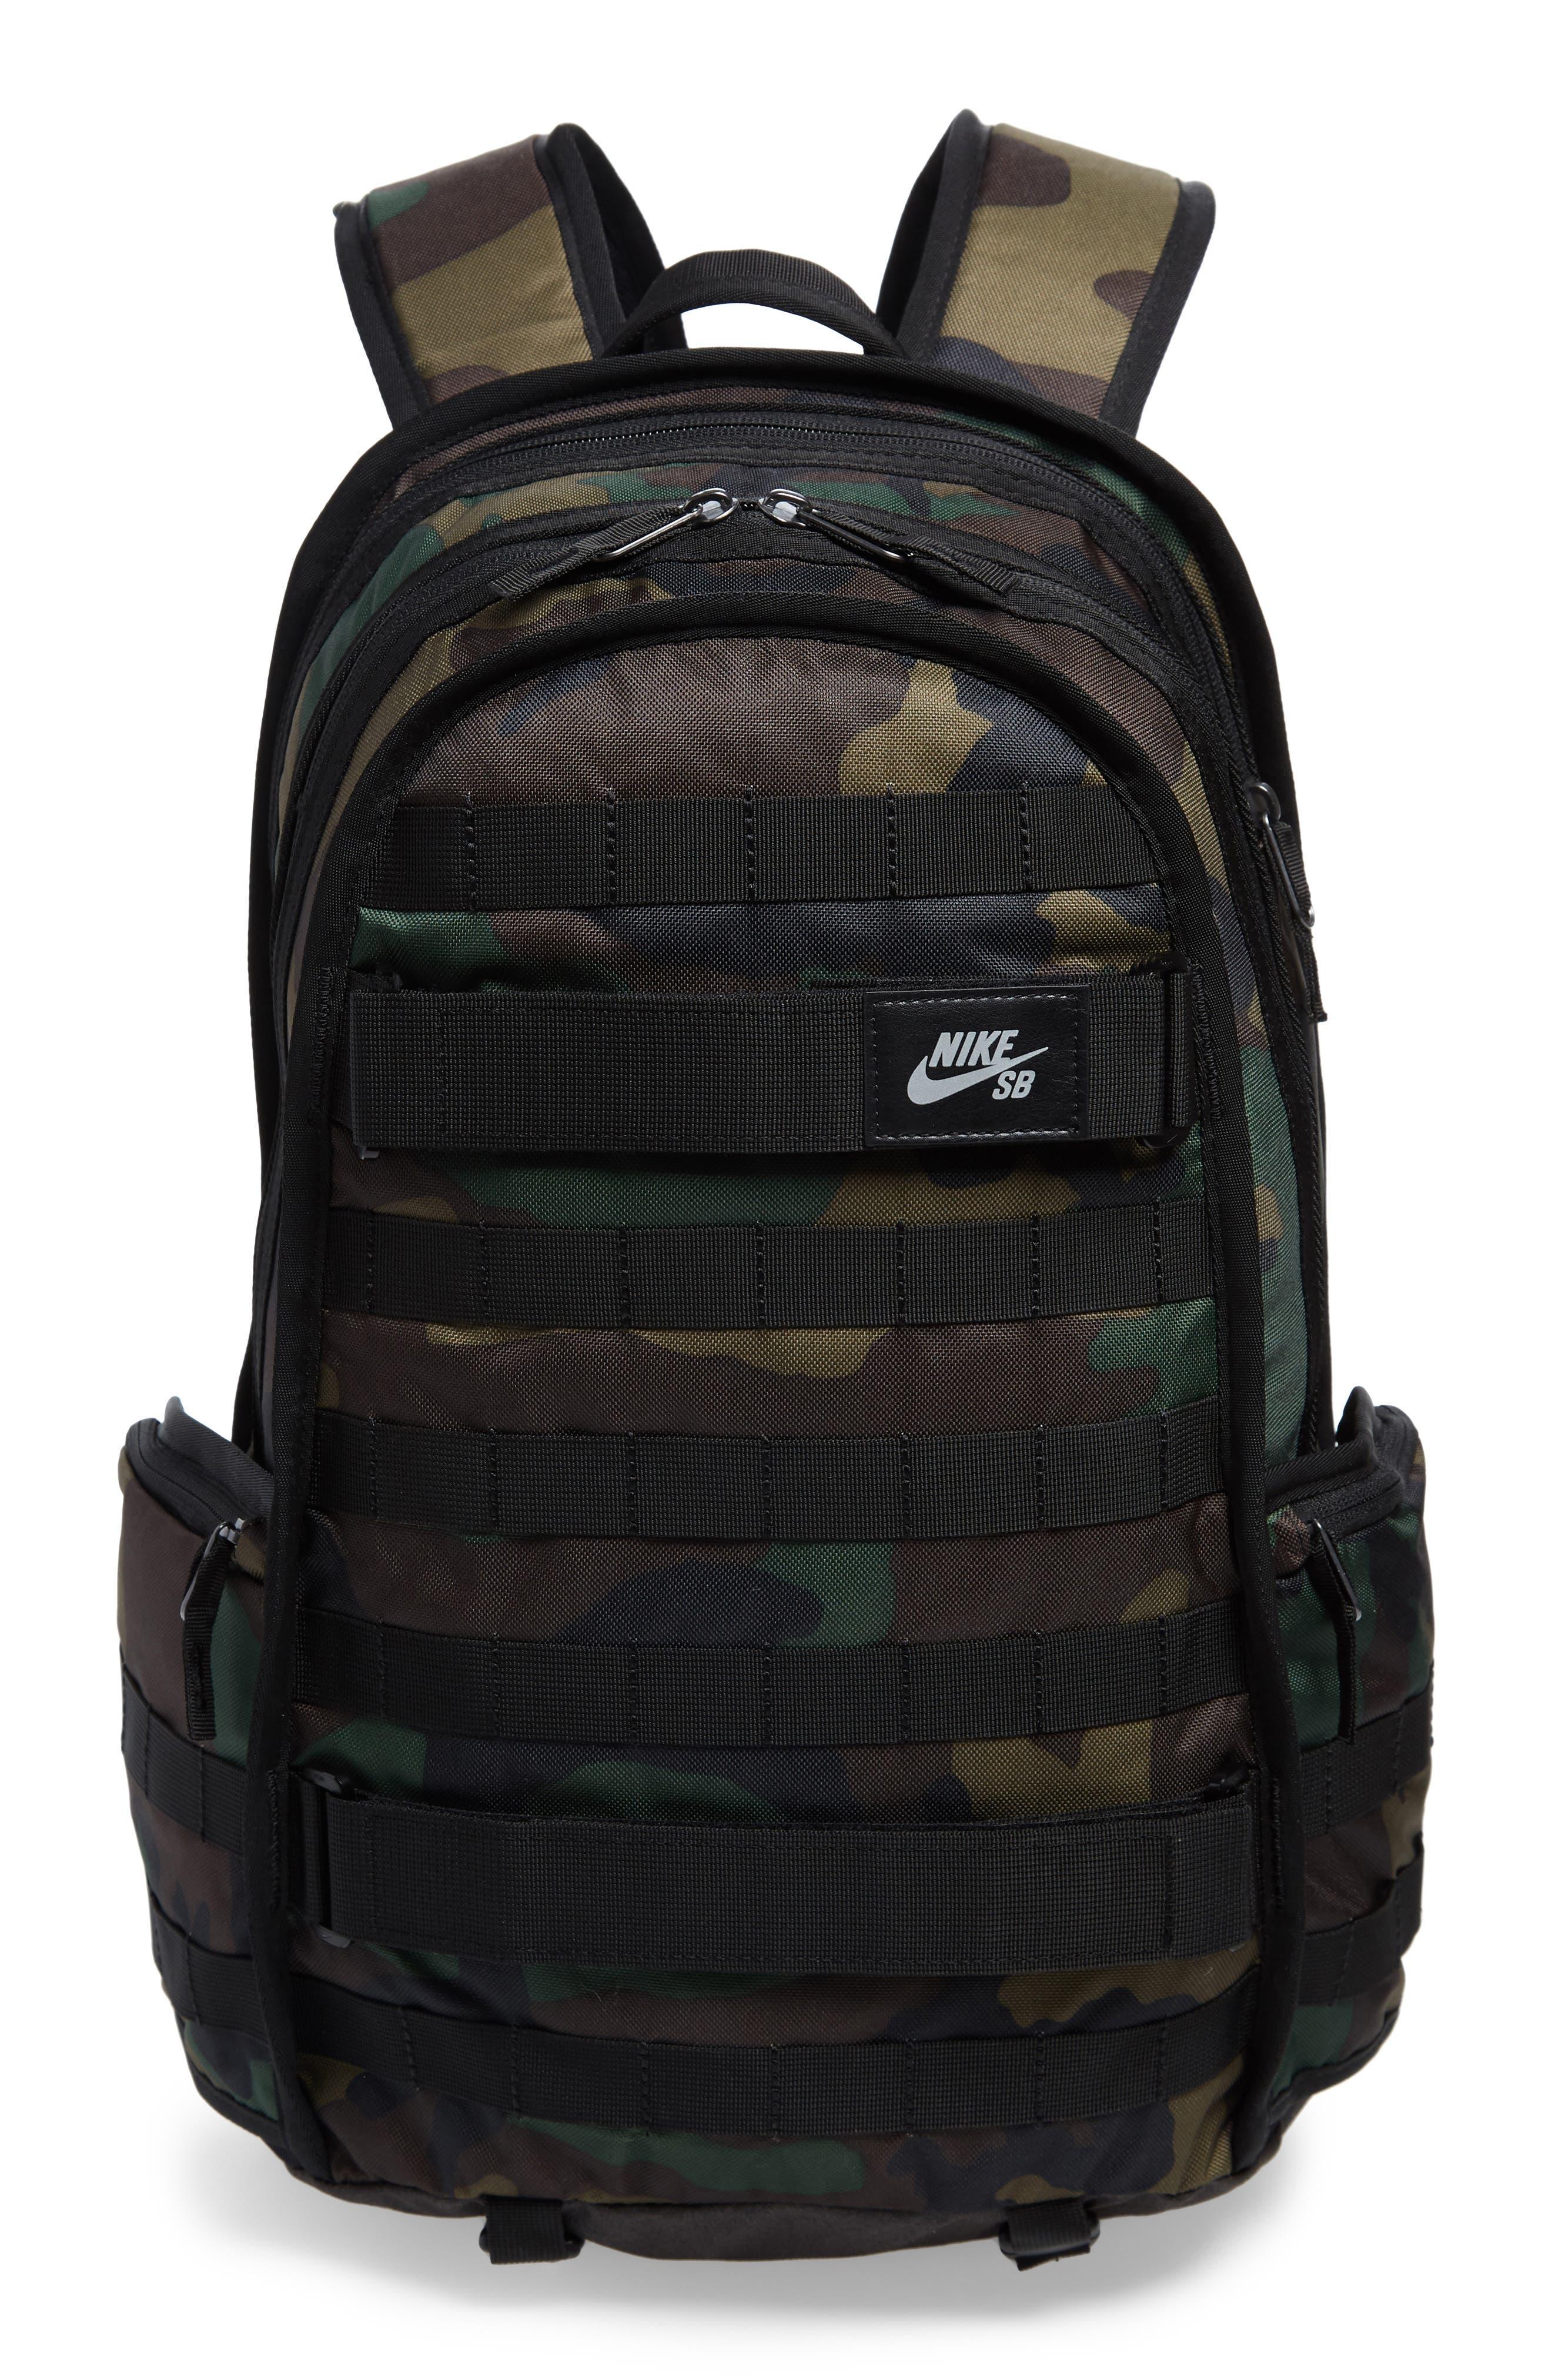 949991192a3 Men s NIKE SB Backpacks  Canvas   Leather   Nordstrom